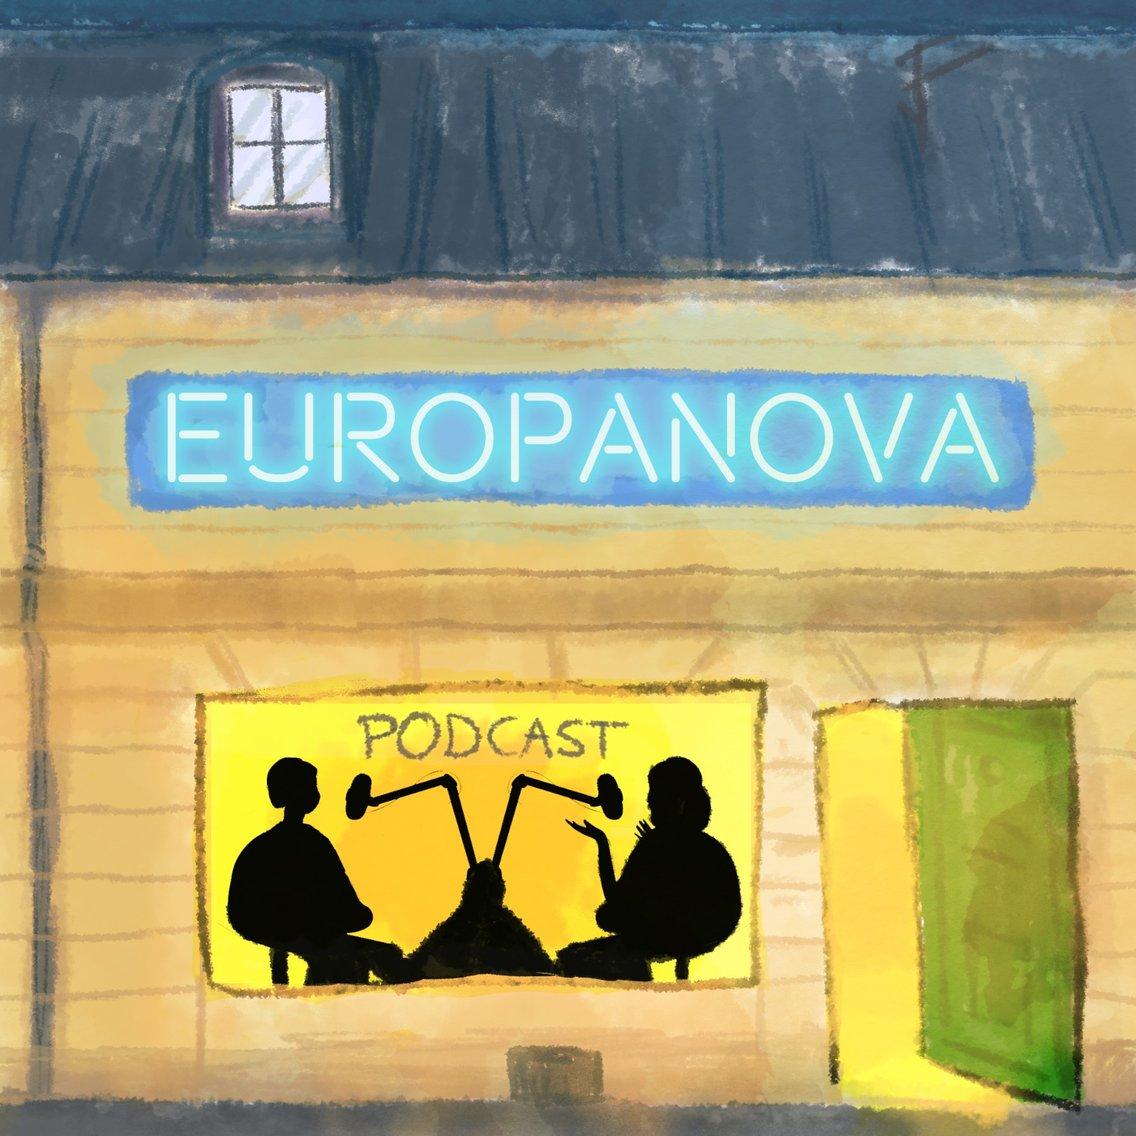 EuropaNova Podcast - immagine di copertina